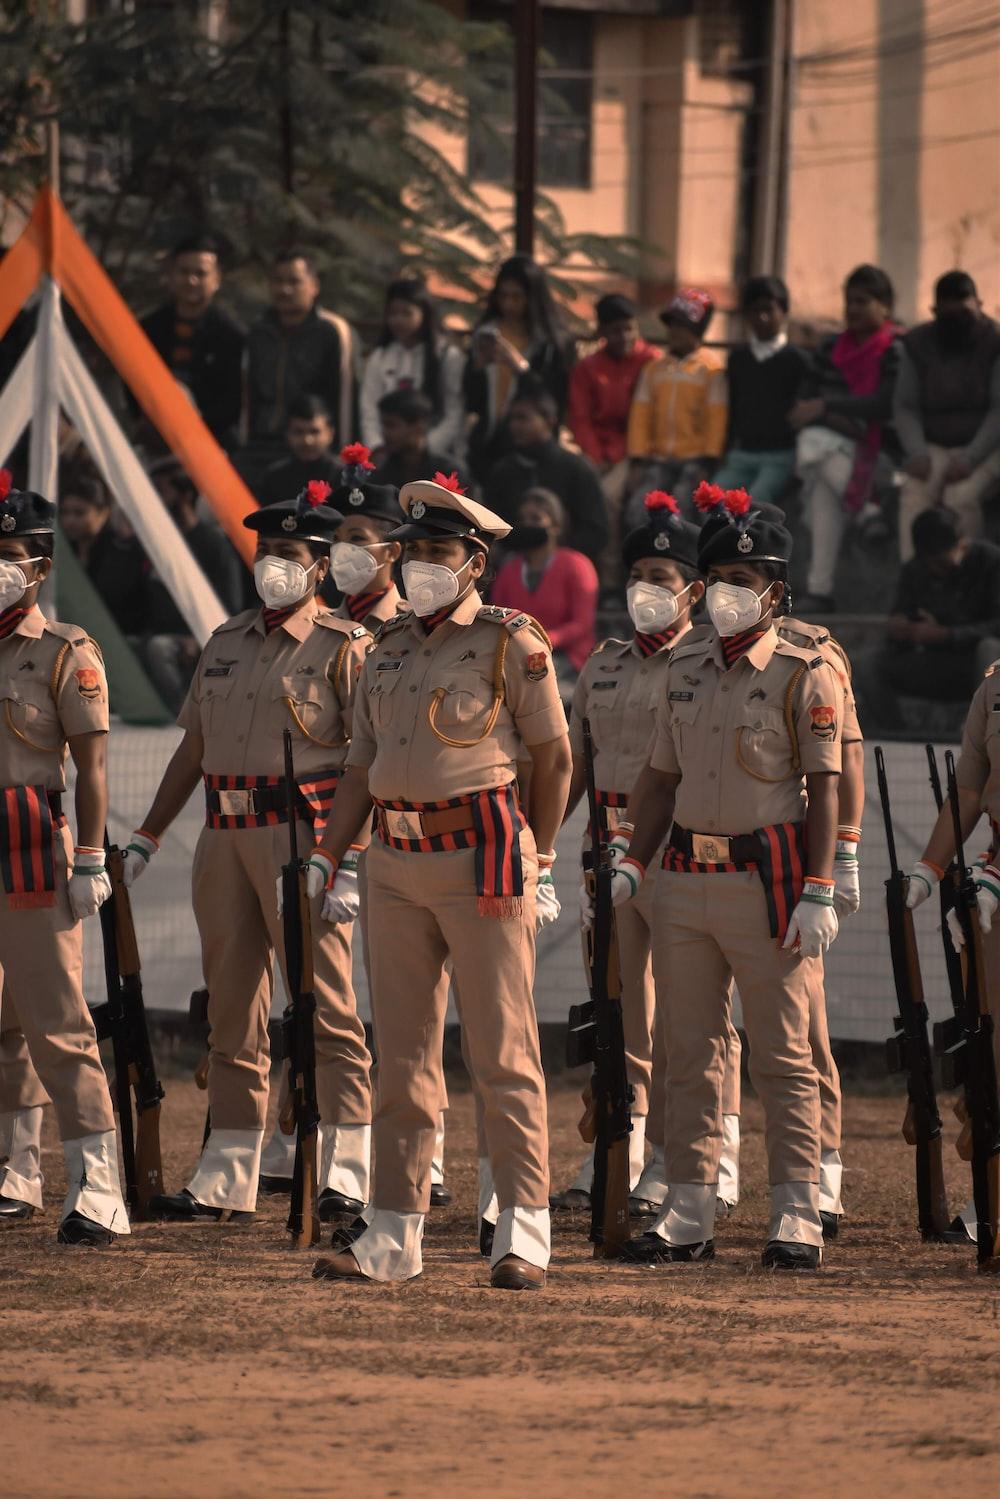 men in brown uniform standing during daytime